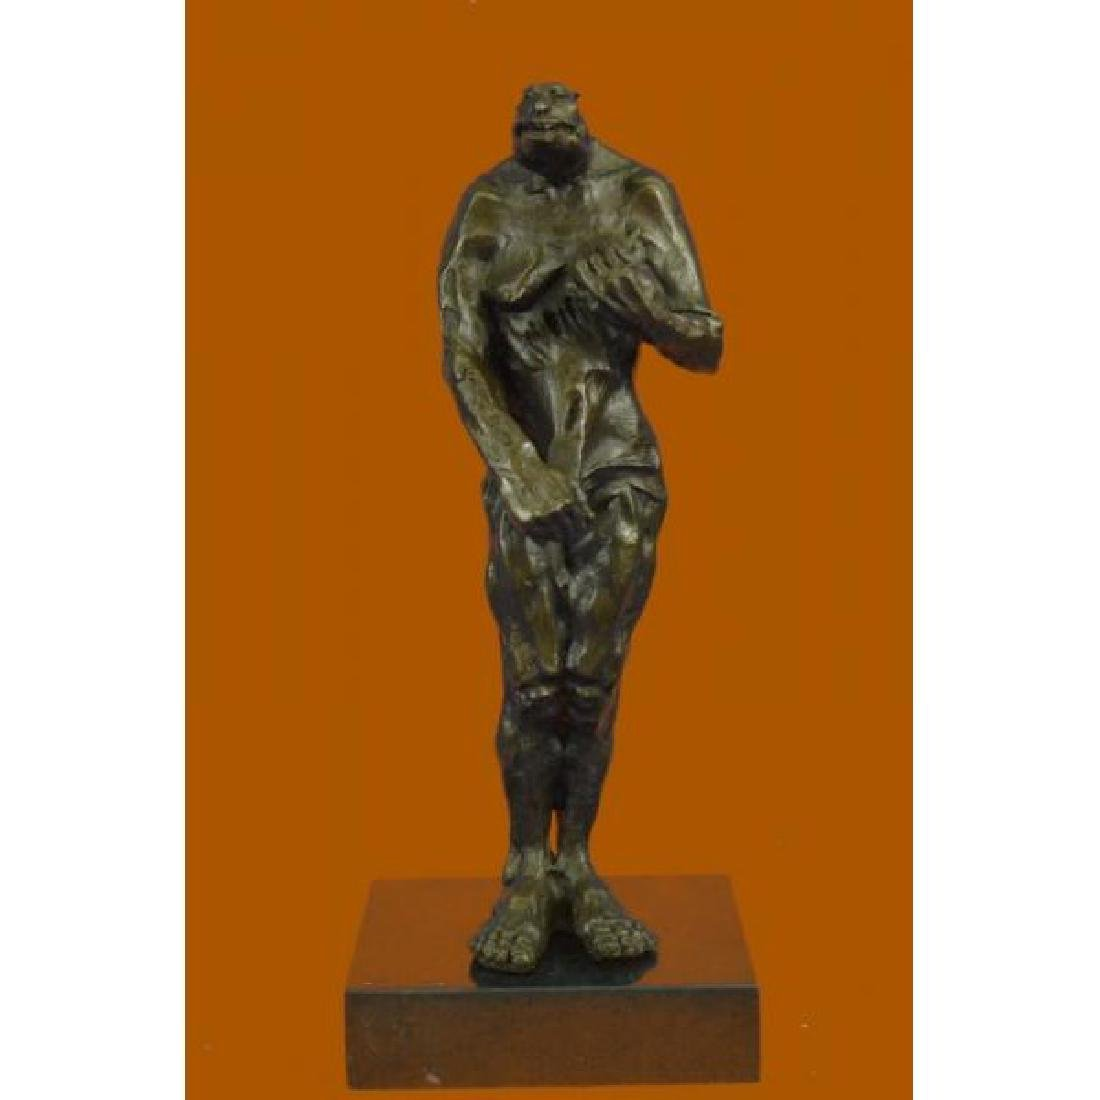 Hot Cast Female Creature Bronze Museum Quality Artwork